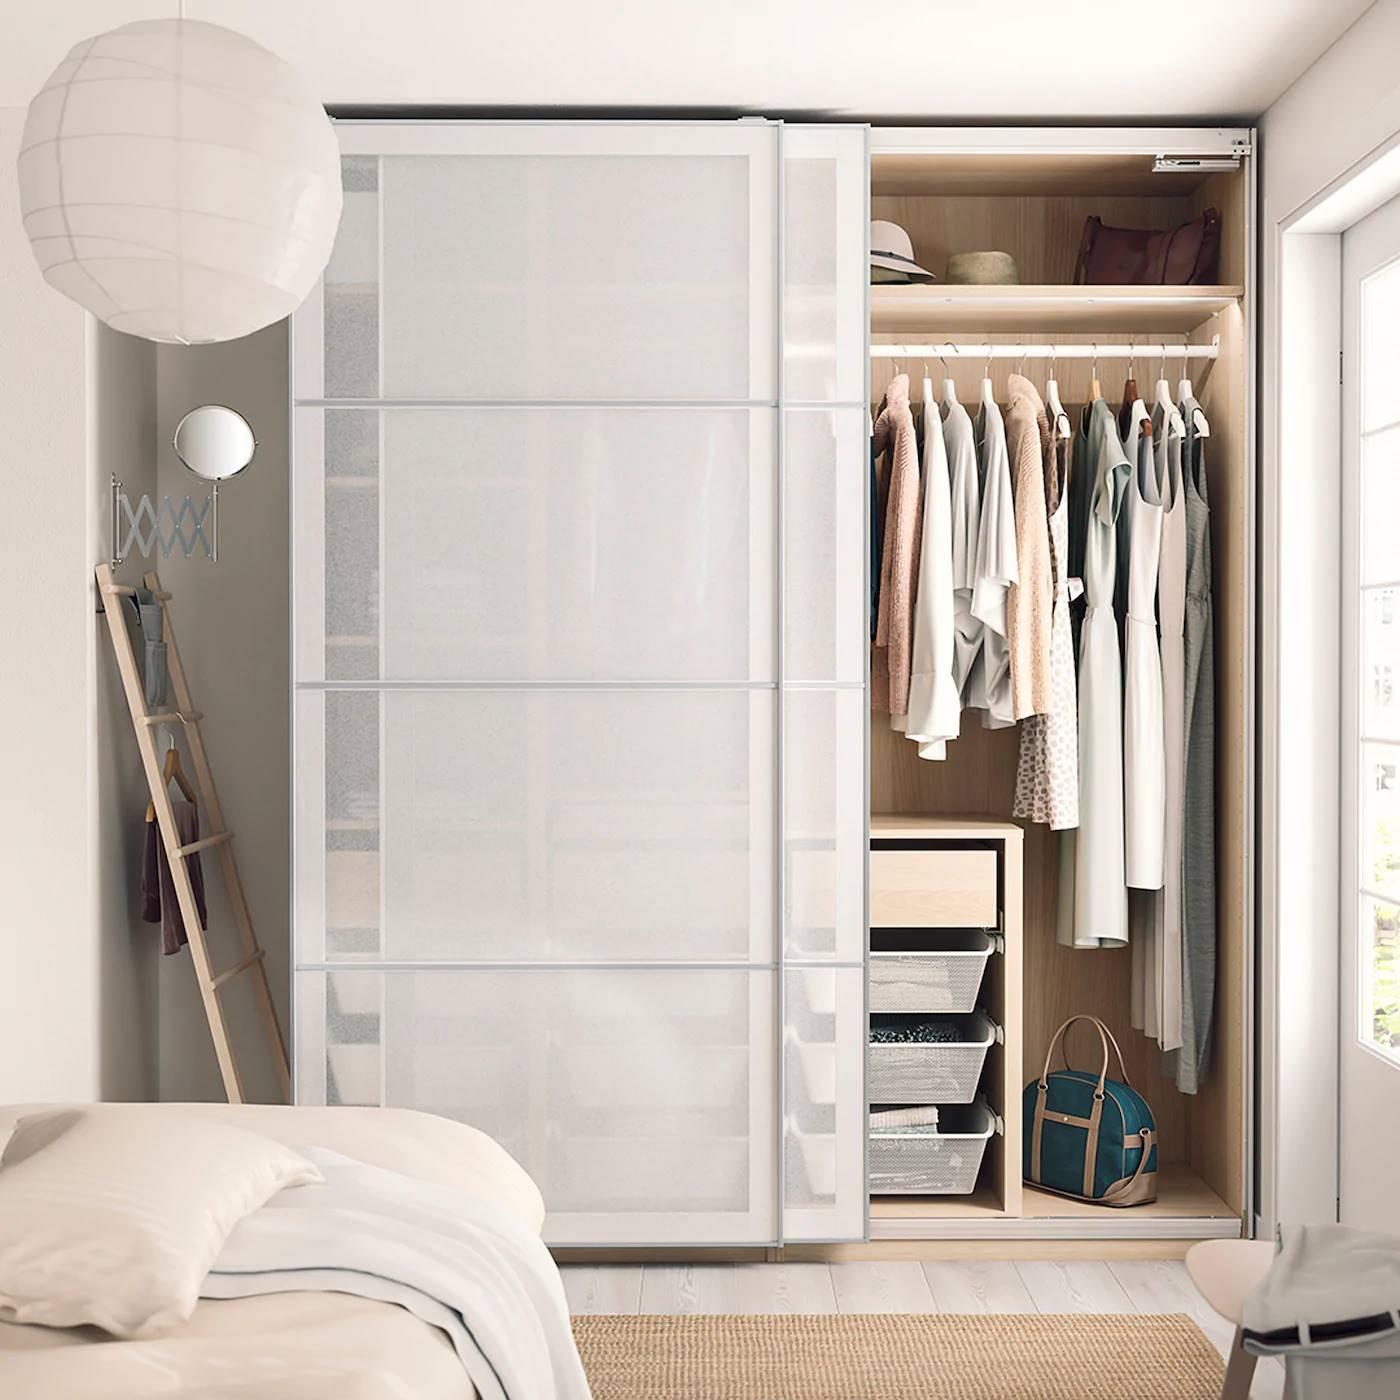 puertas para armarios pax ikea